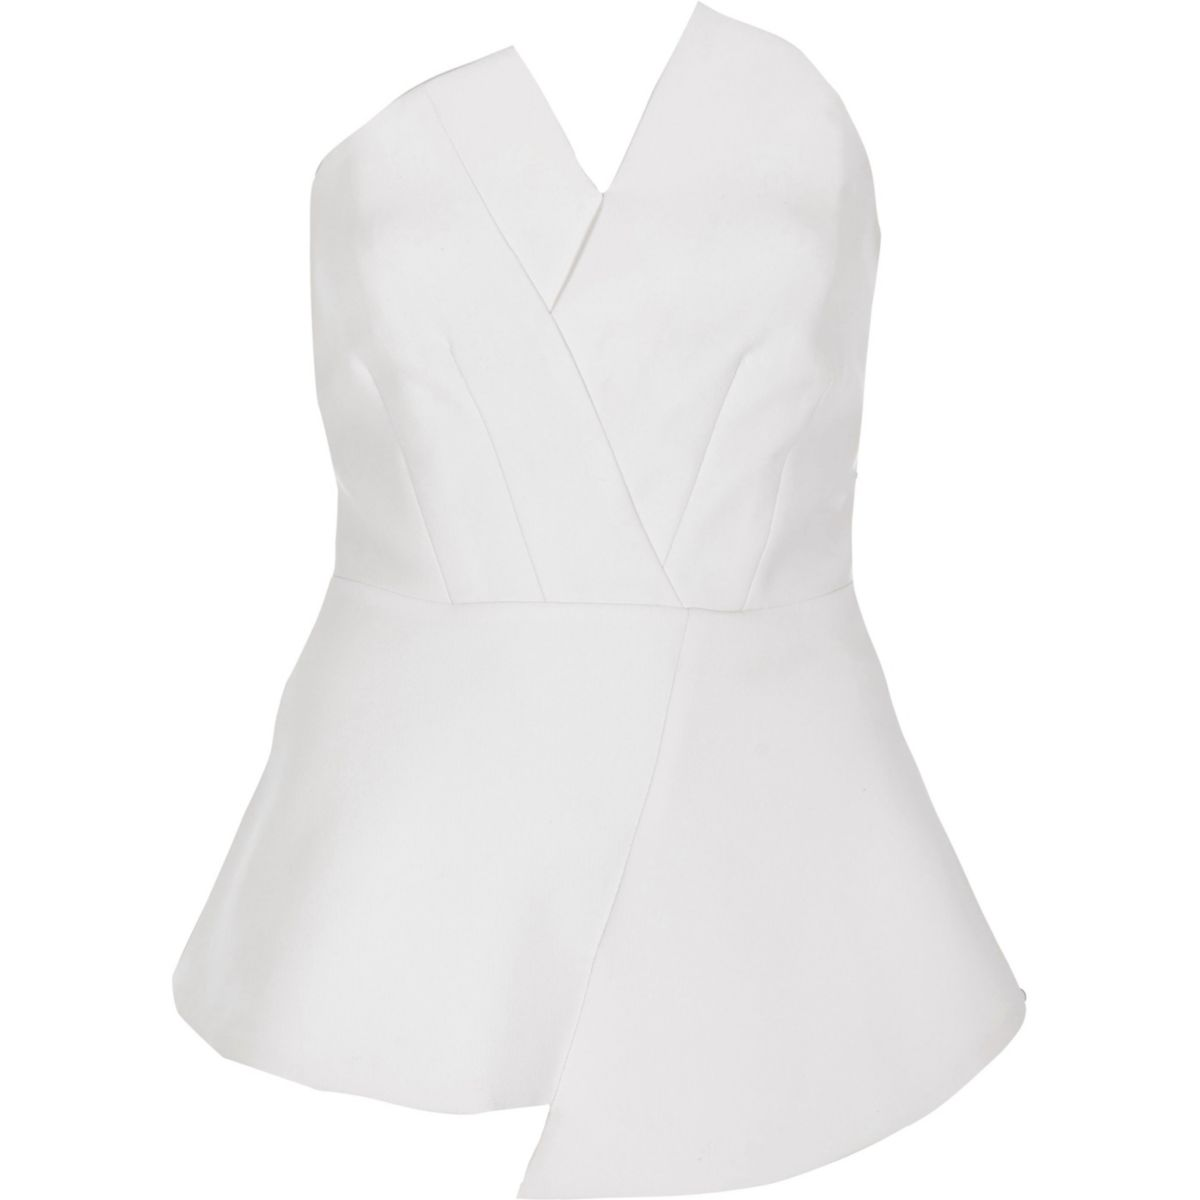 White asymmetric peplum bandeau top